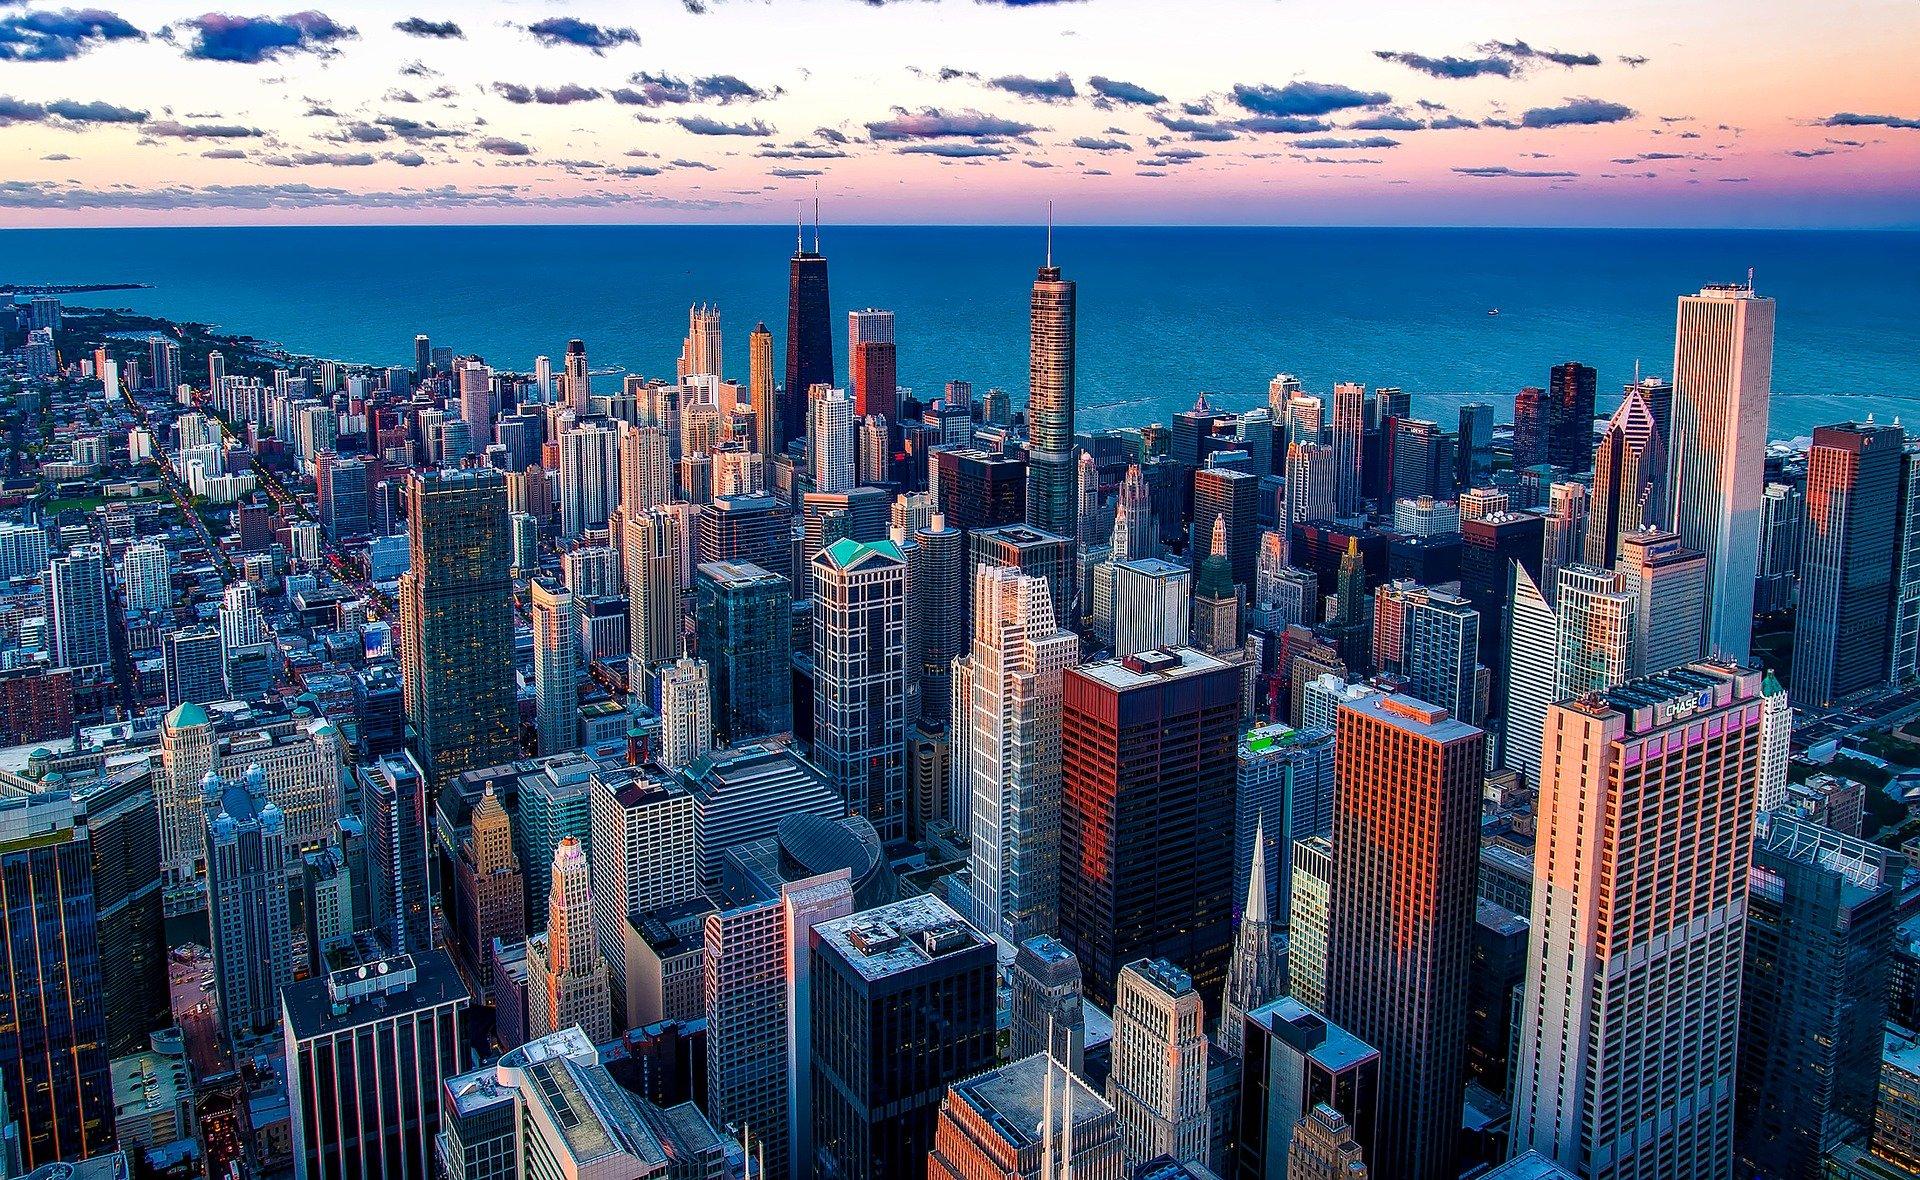 chicago-1791002_1920 (1)